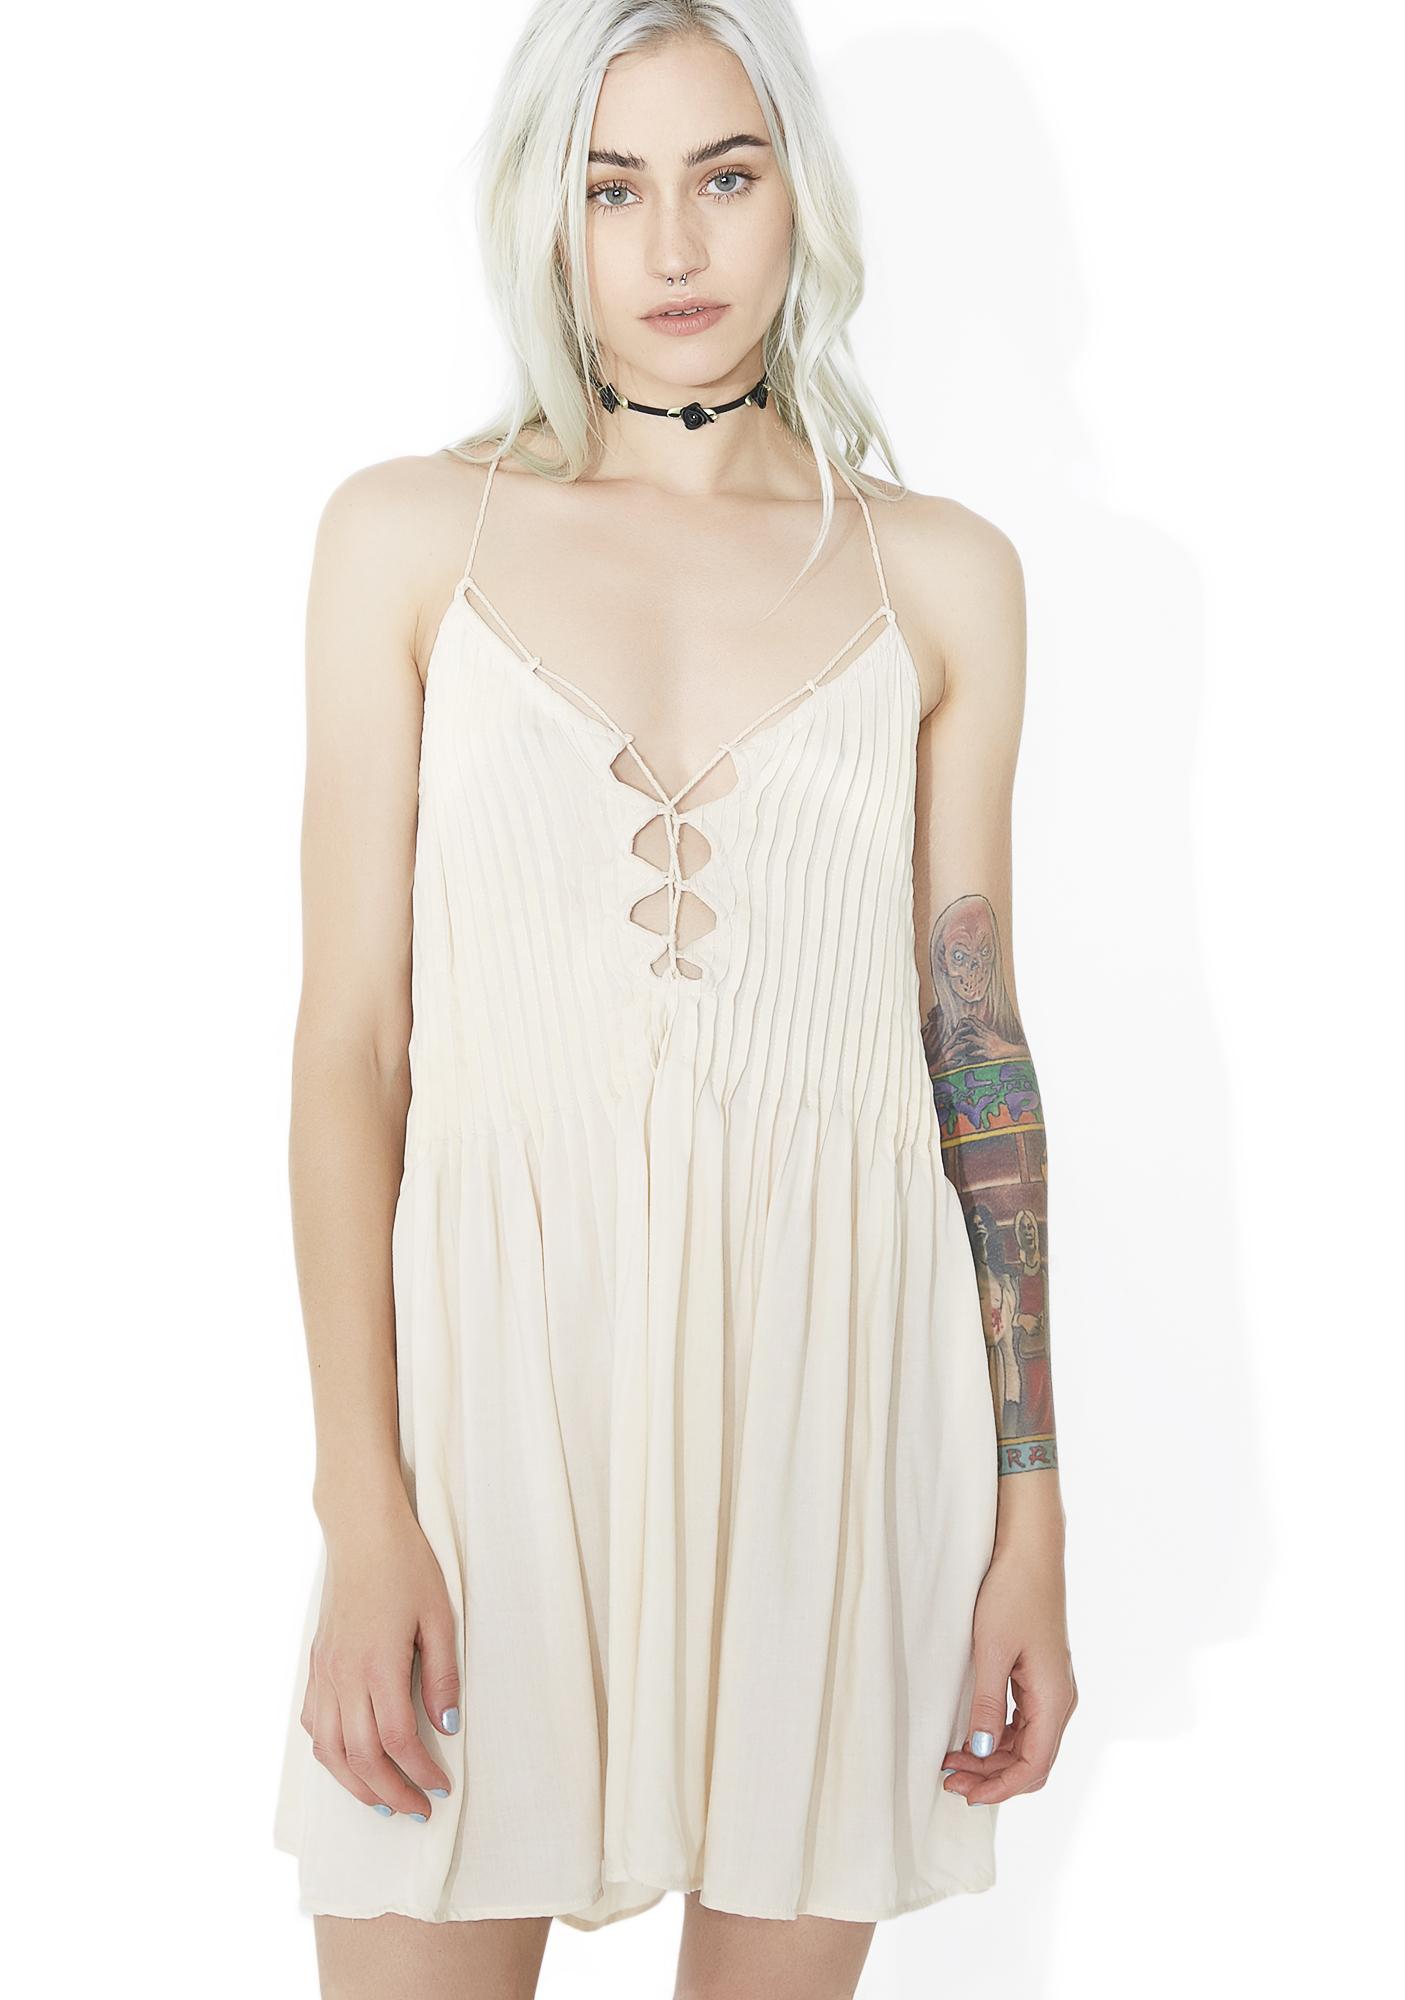 Beige Lace Up Slip Dress